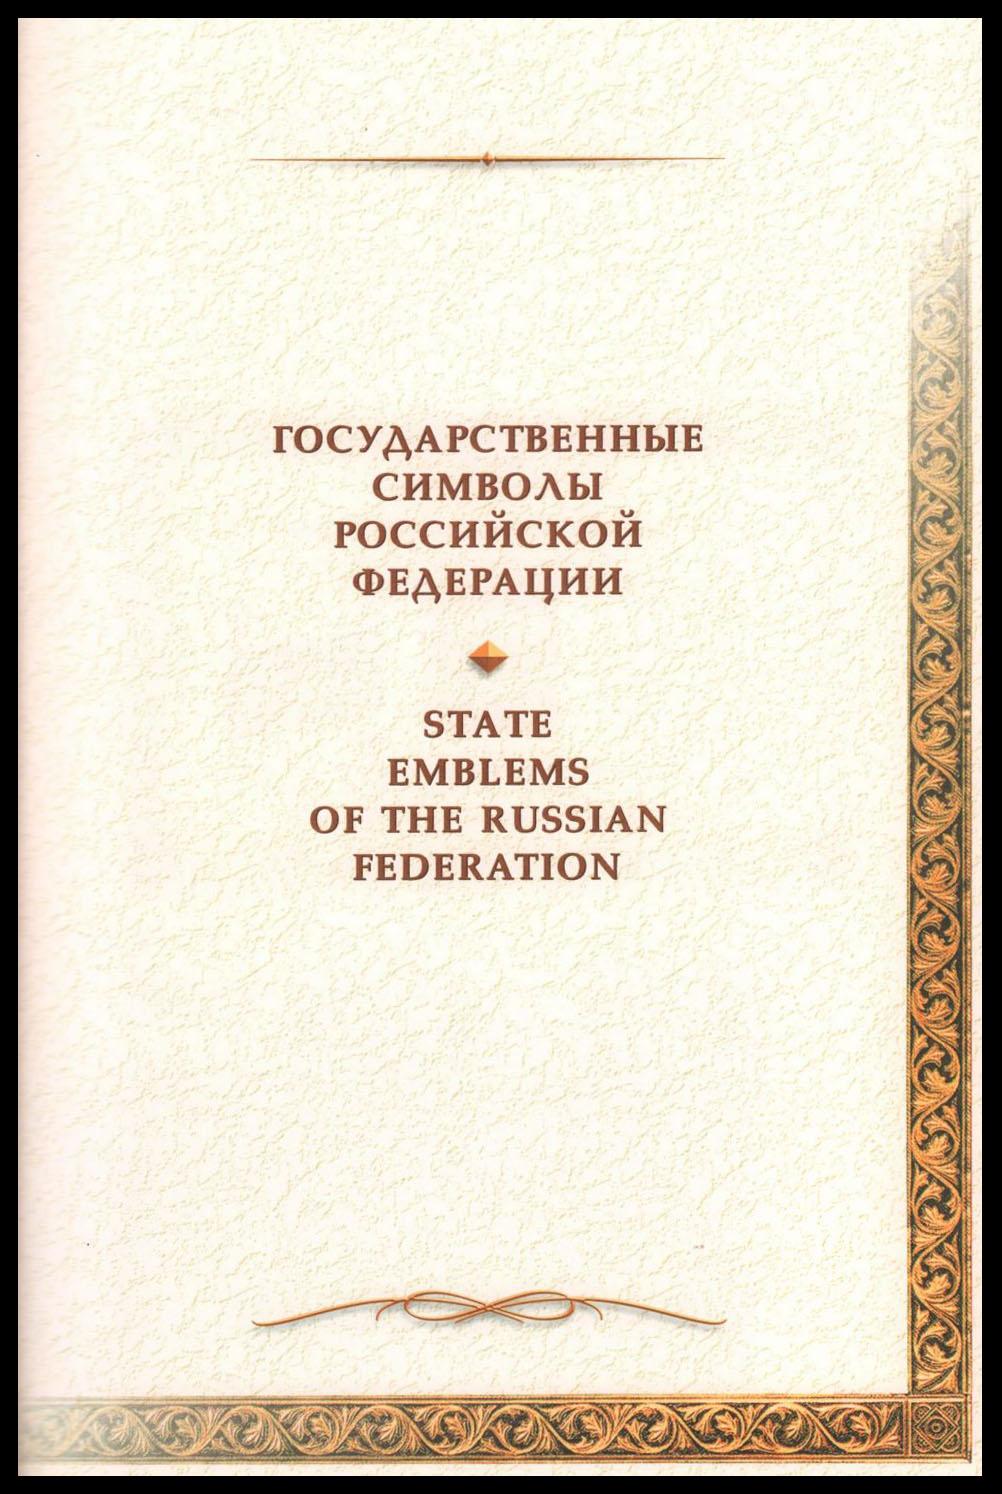 Lot 1293 - Russia -Modern Russian Federation  Issues Souvenir Booklets -  Raritan Stamps Inc. Live Bidding Auction #81